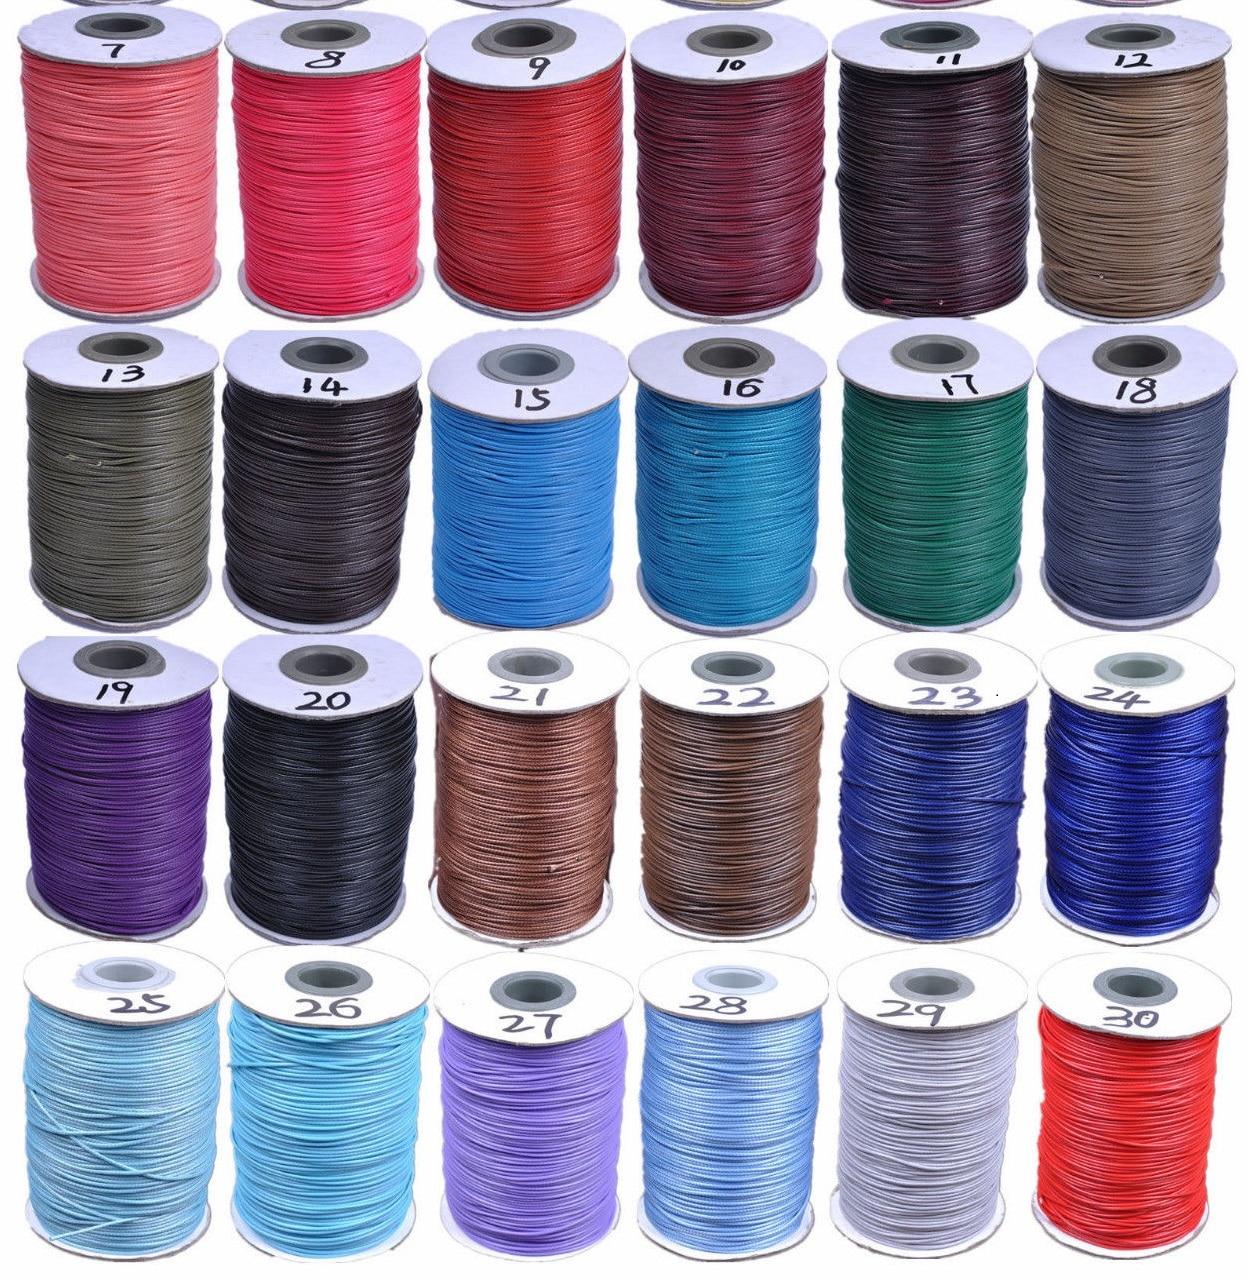 200 Yards 1mm Wax String Wire Thread Cord dacron fiber 30 Colors